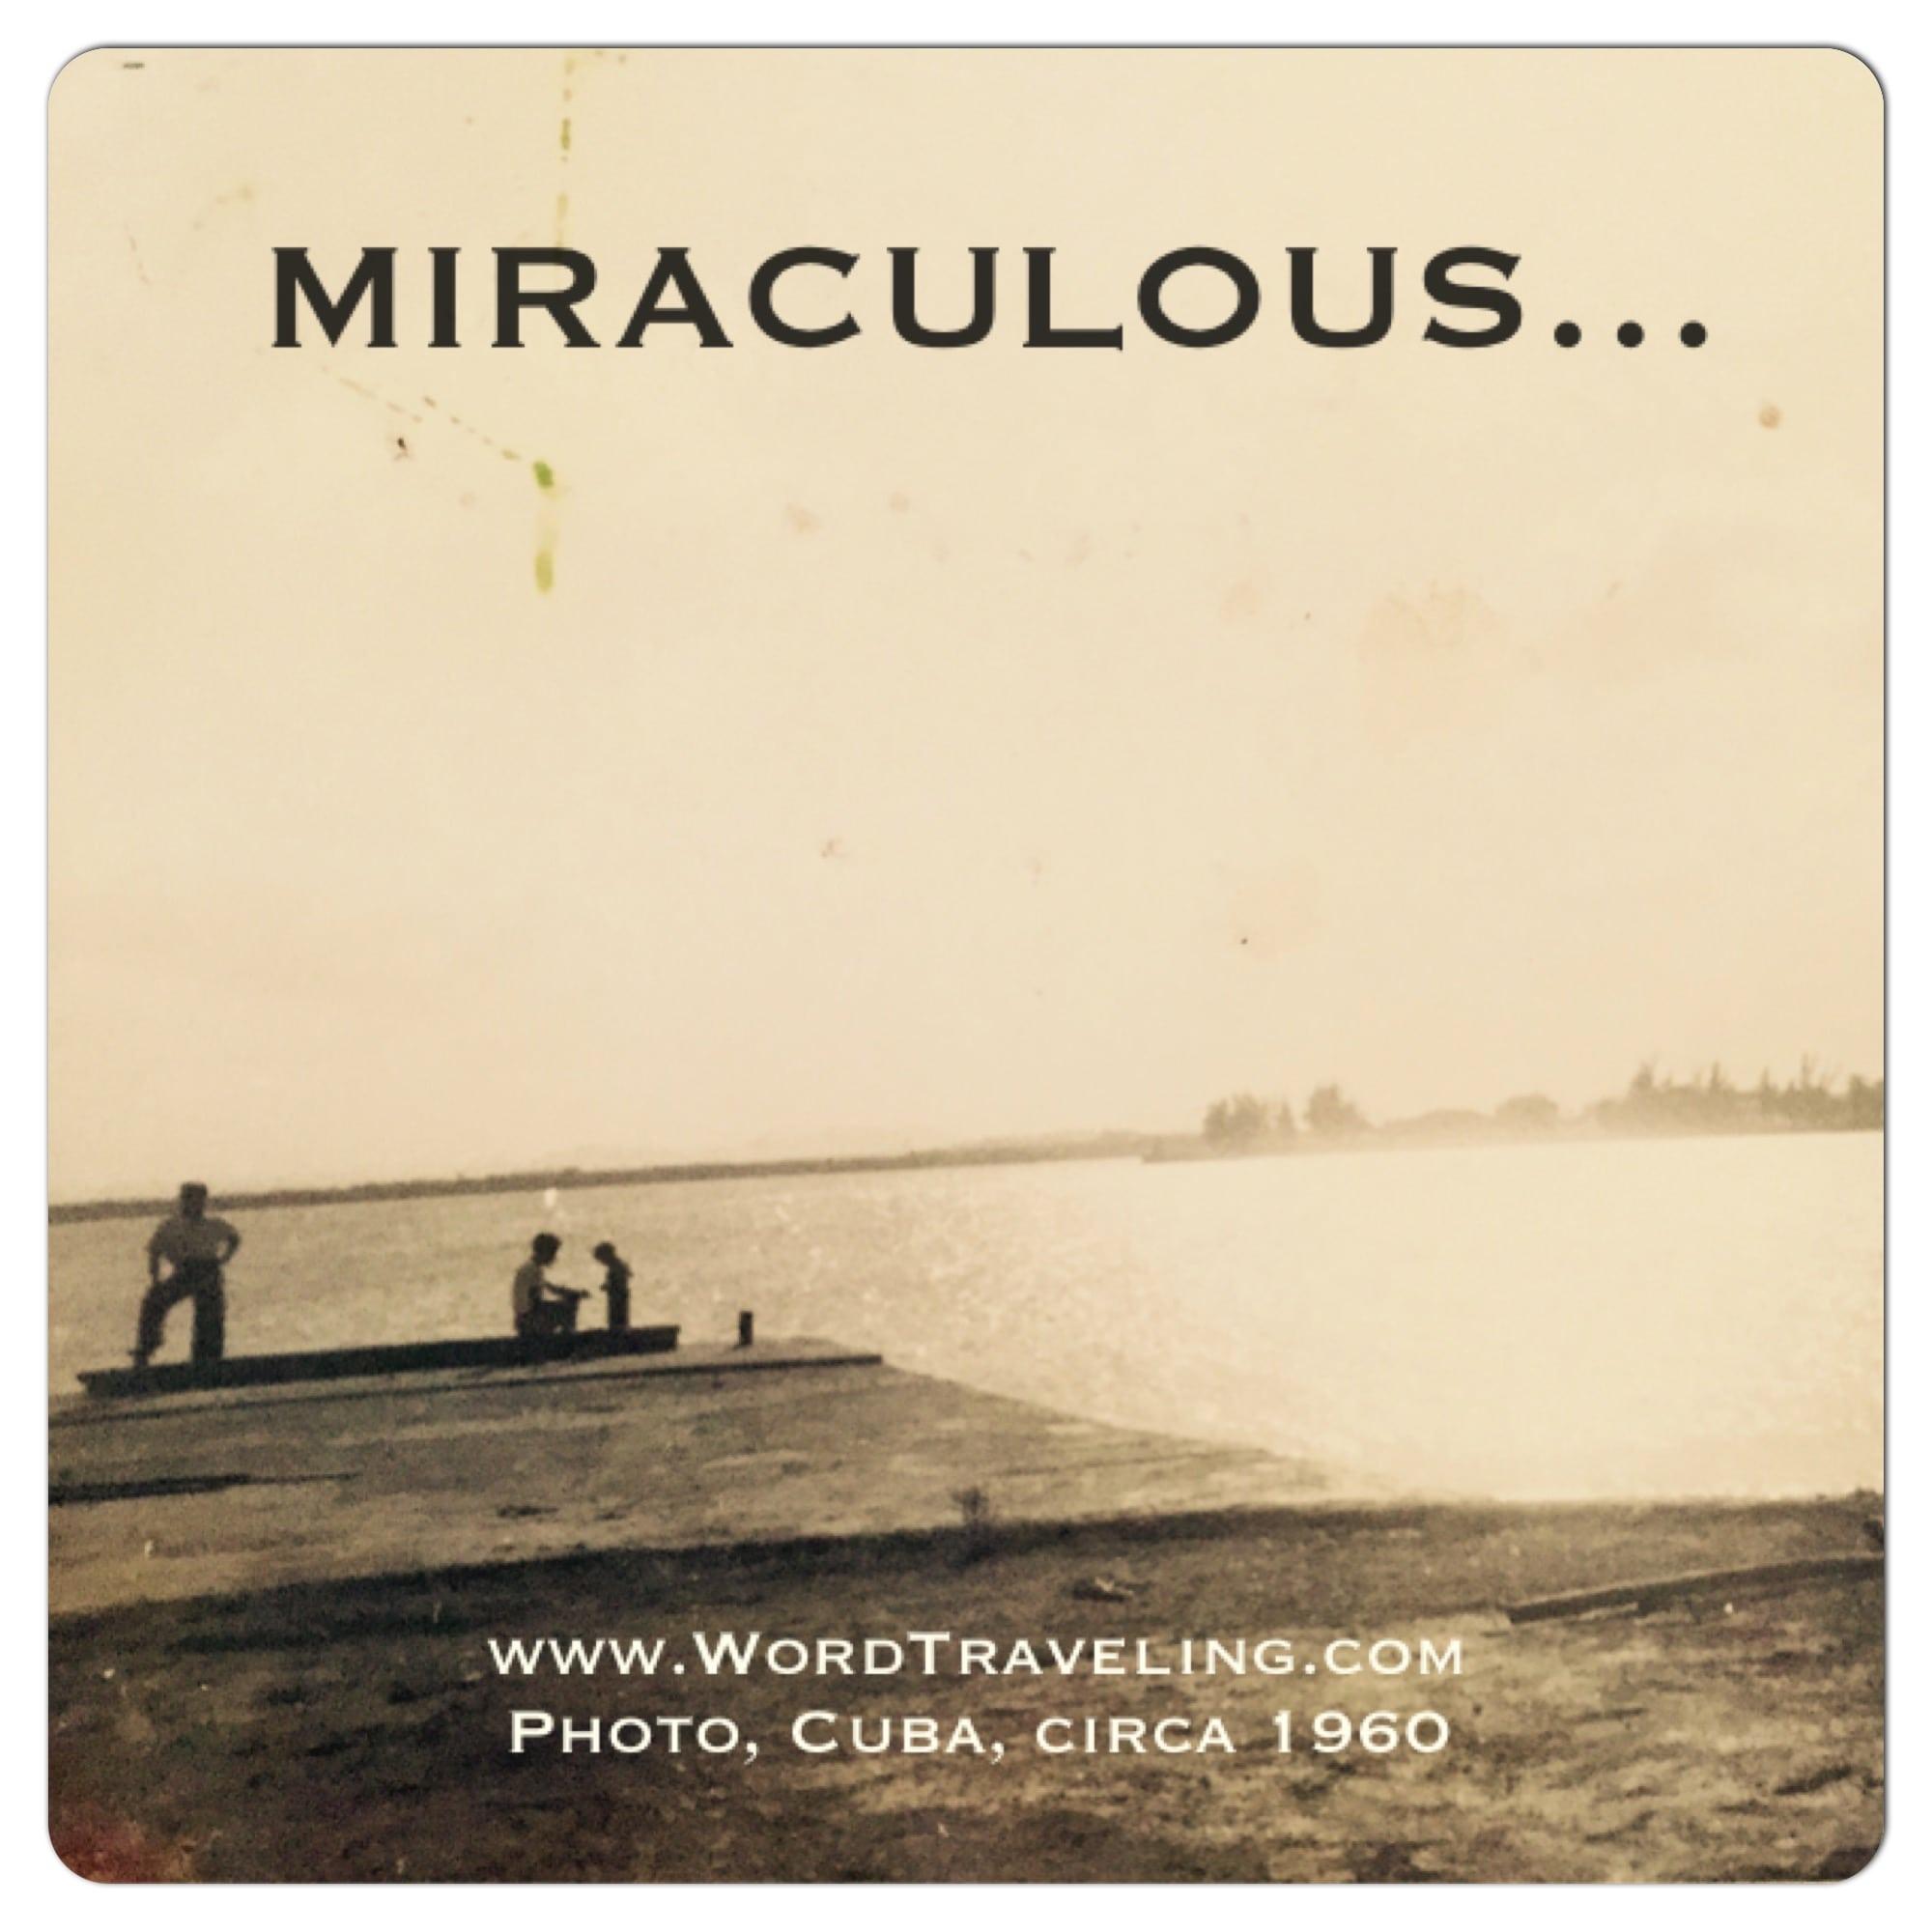 miraculous- Cuba, 1960